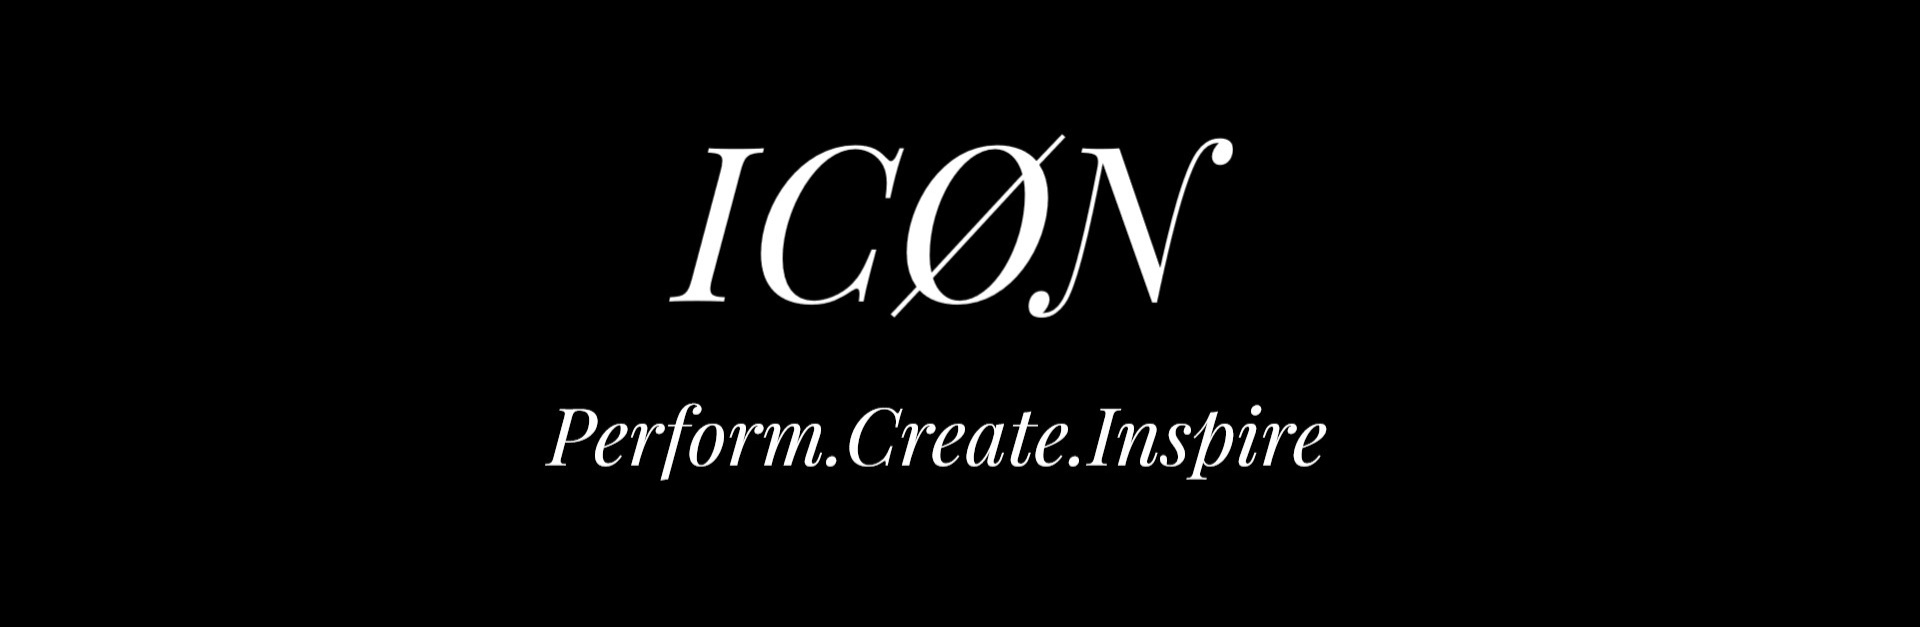 ICON+16x9+Logo+%28perform+create+inspire%29.jpg